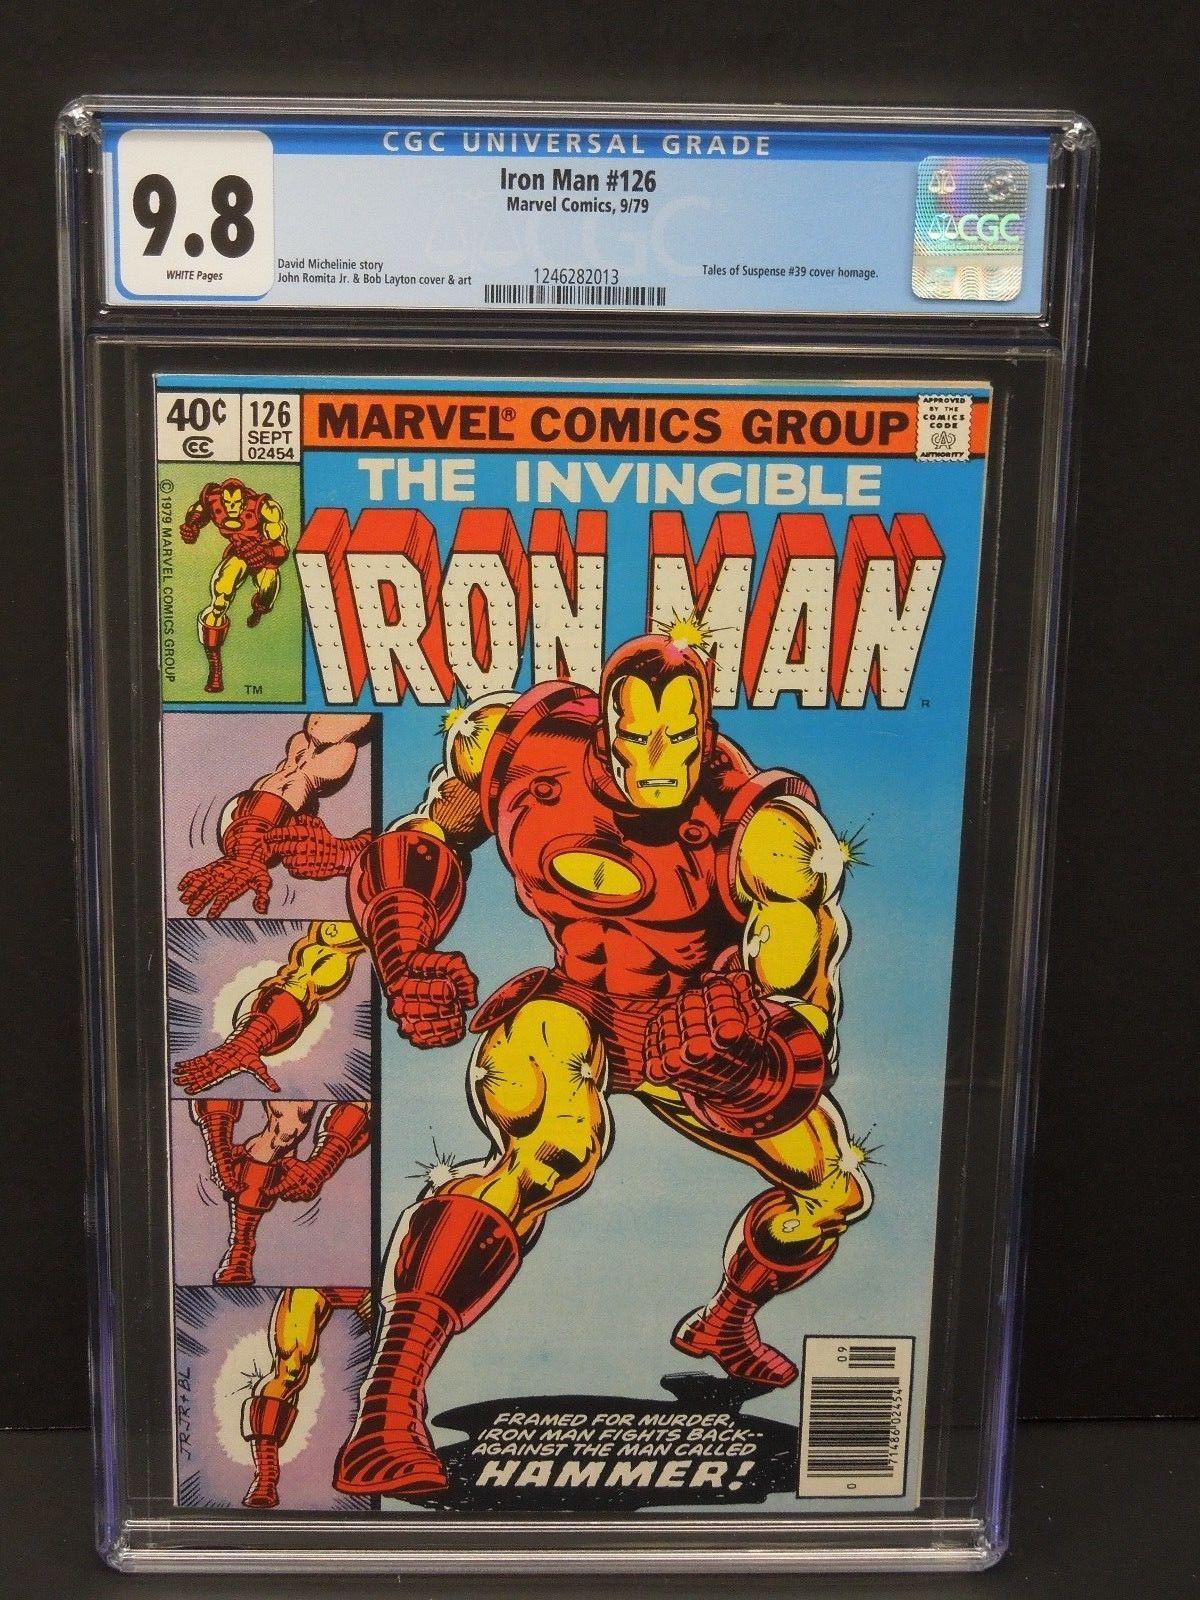 MARVEL COMICS IRON MAN #126 1979 CGC 9.8 TALES OF SUSPENSE #39 COVER HOMAGE